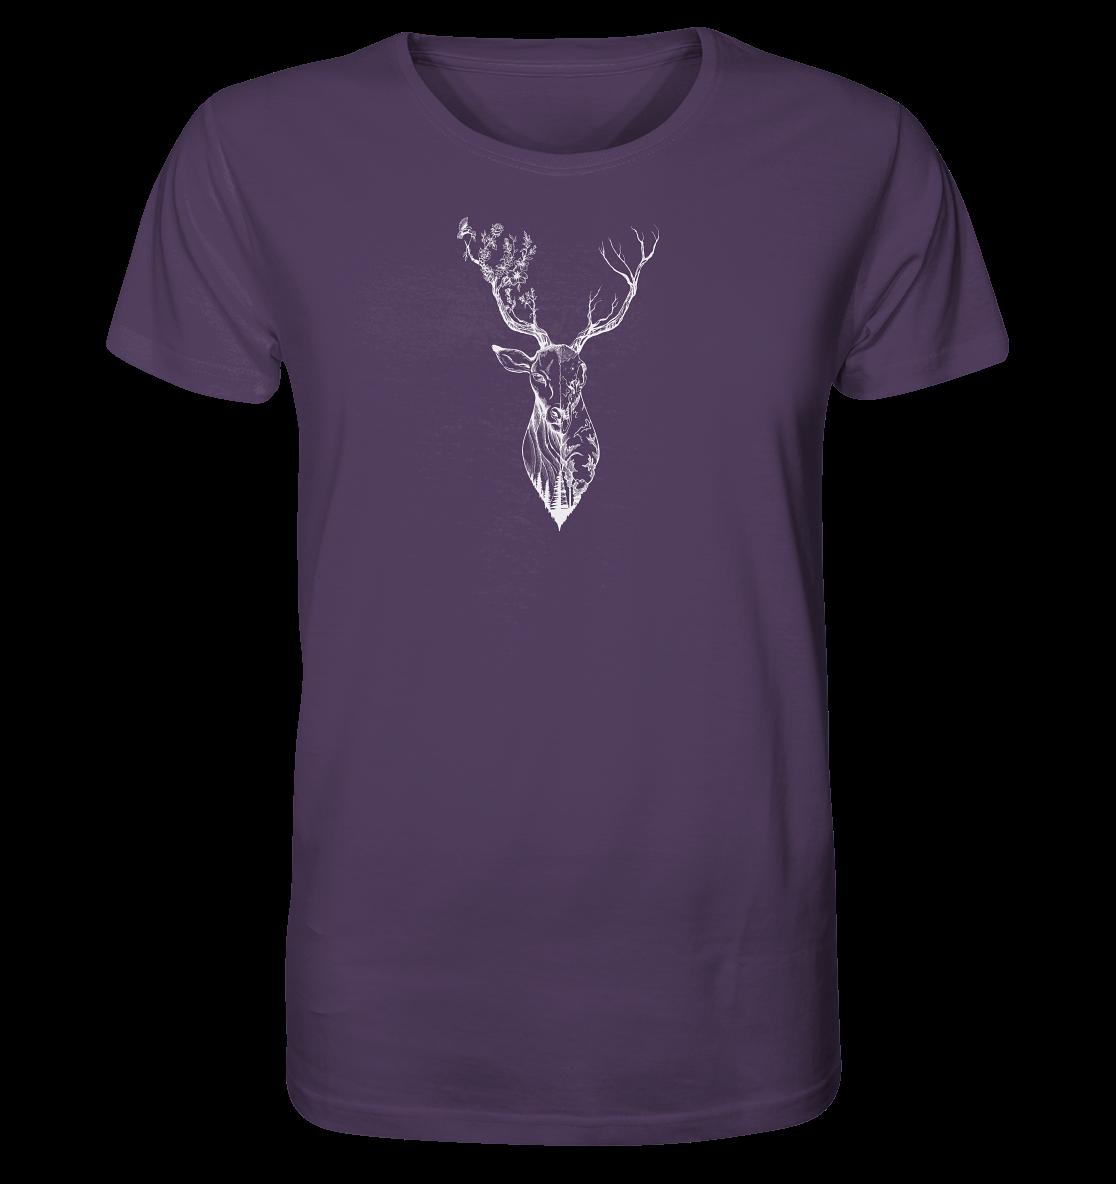 front-organic-shirt-523f5f-1116x-7.png